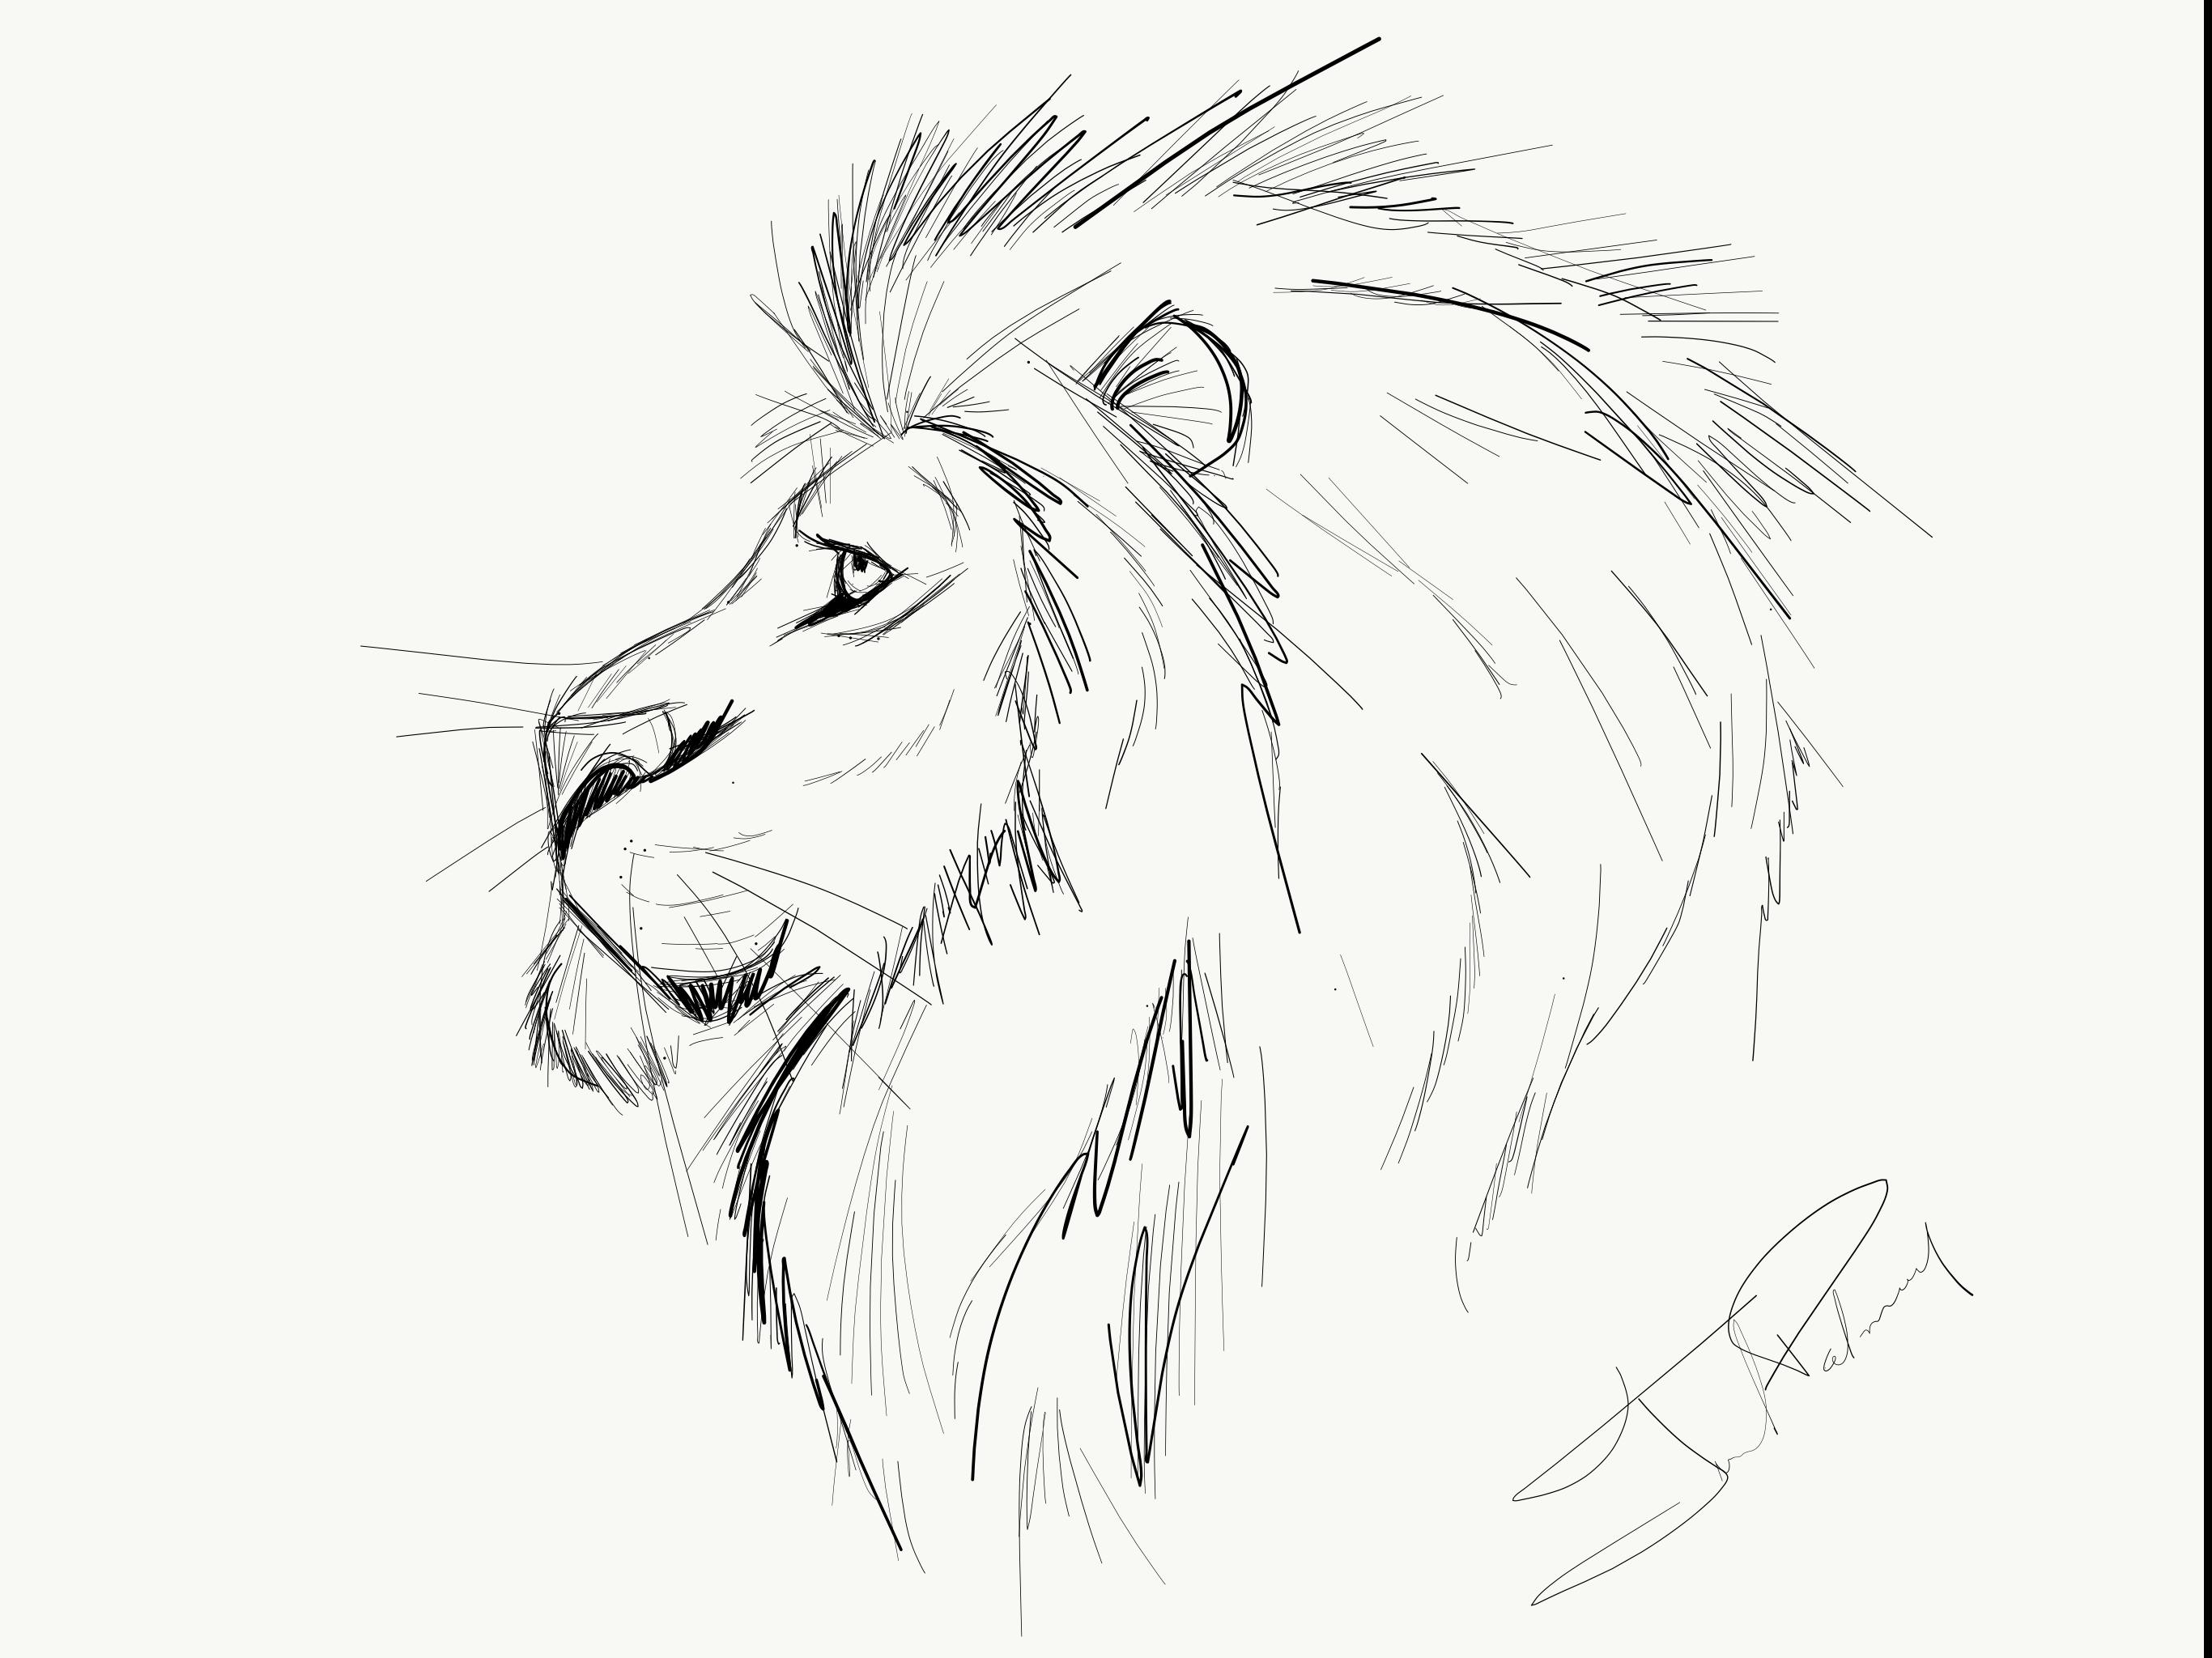 Fine Line Lion Sketch Lowe Skizze Zeichnung Inspiration Lowen Illustration